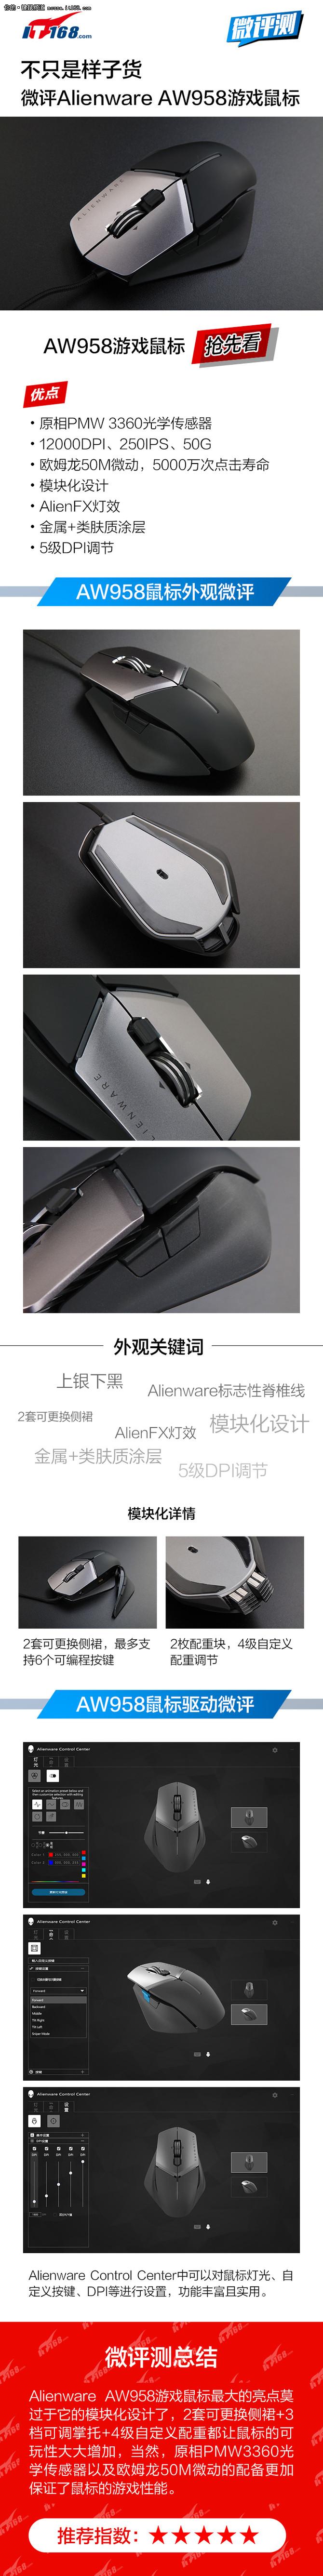 微评Alienware AW958游戏鼠标